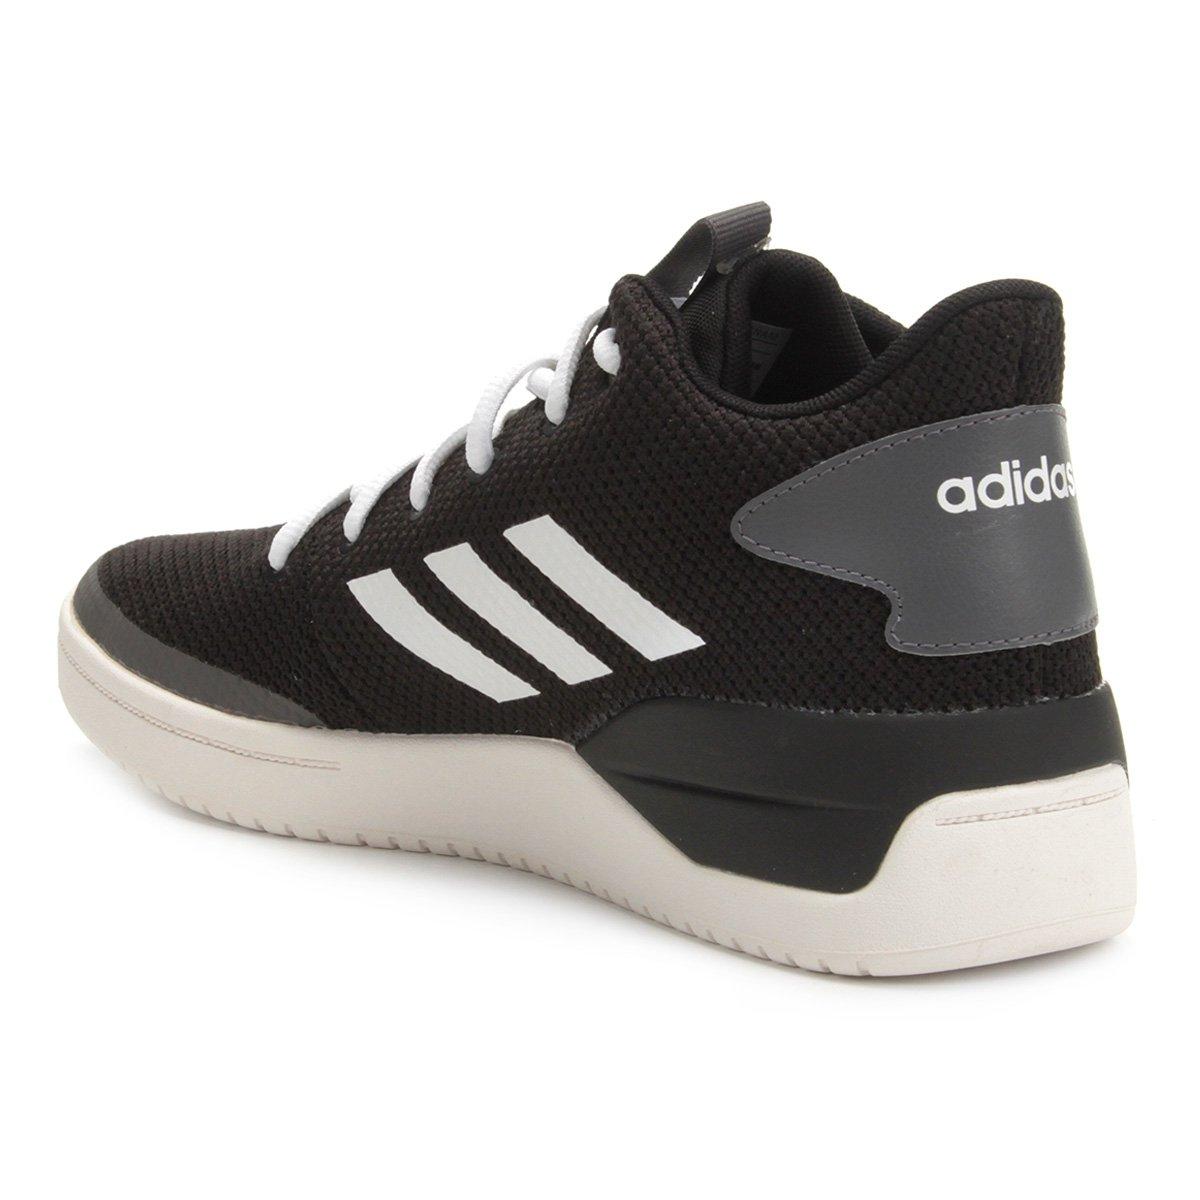 Tênis Adidas Retro Bball Masculino  Tênis Adidas Retro Bball Masculino ... c86eefd292f21